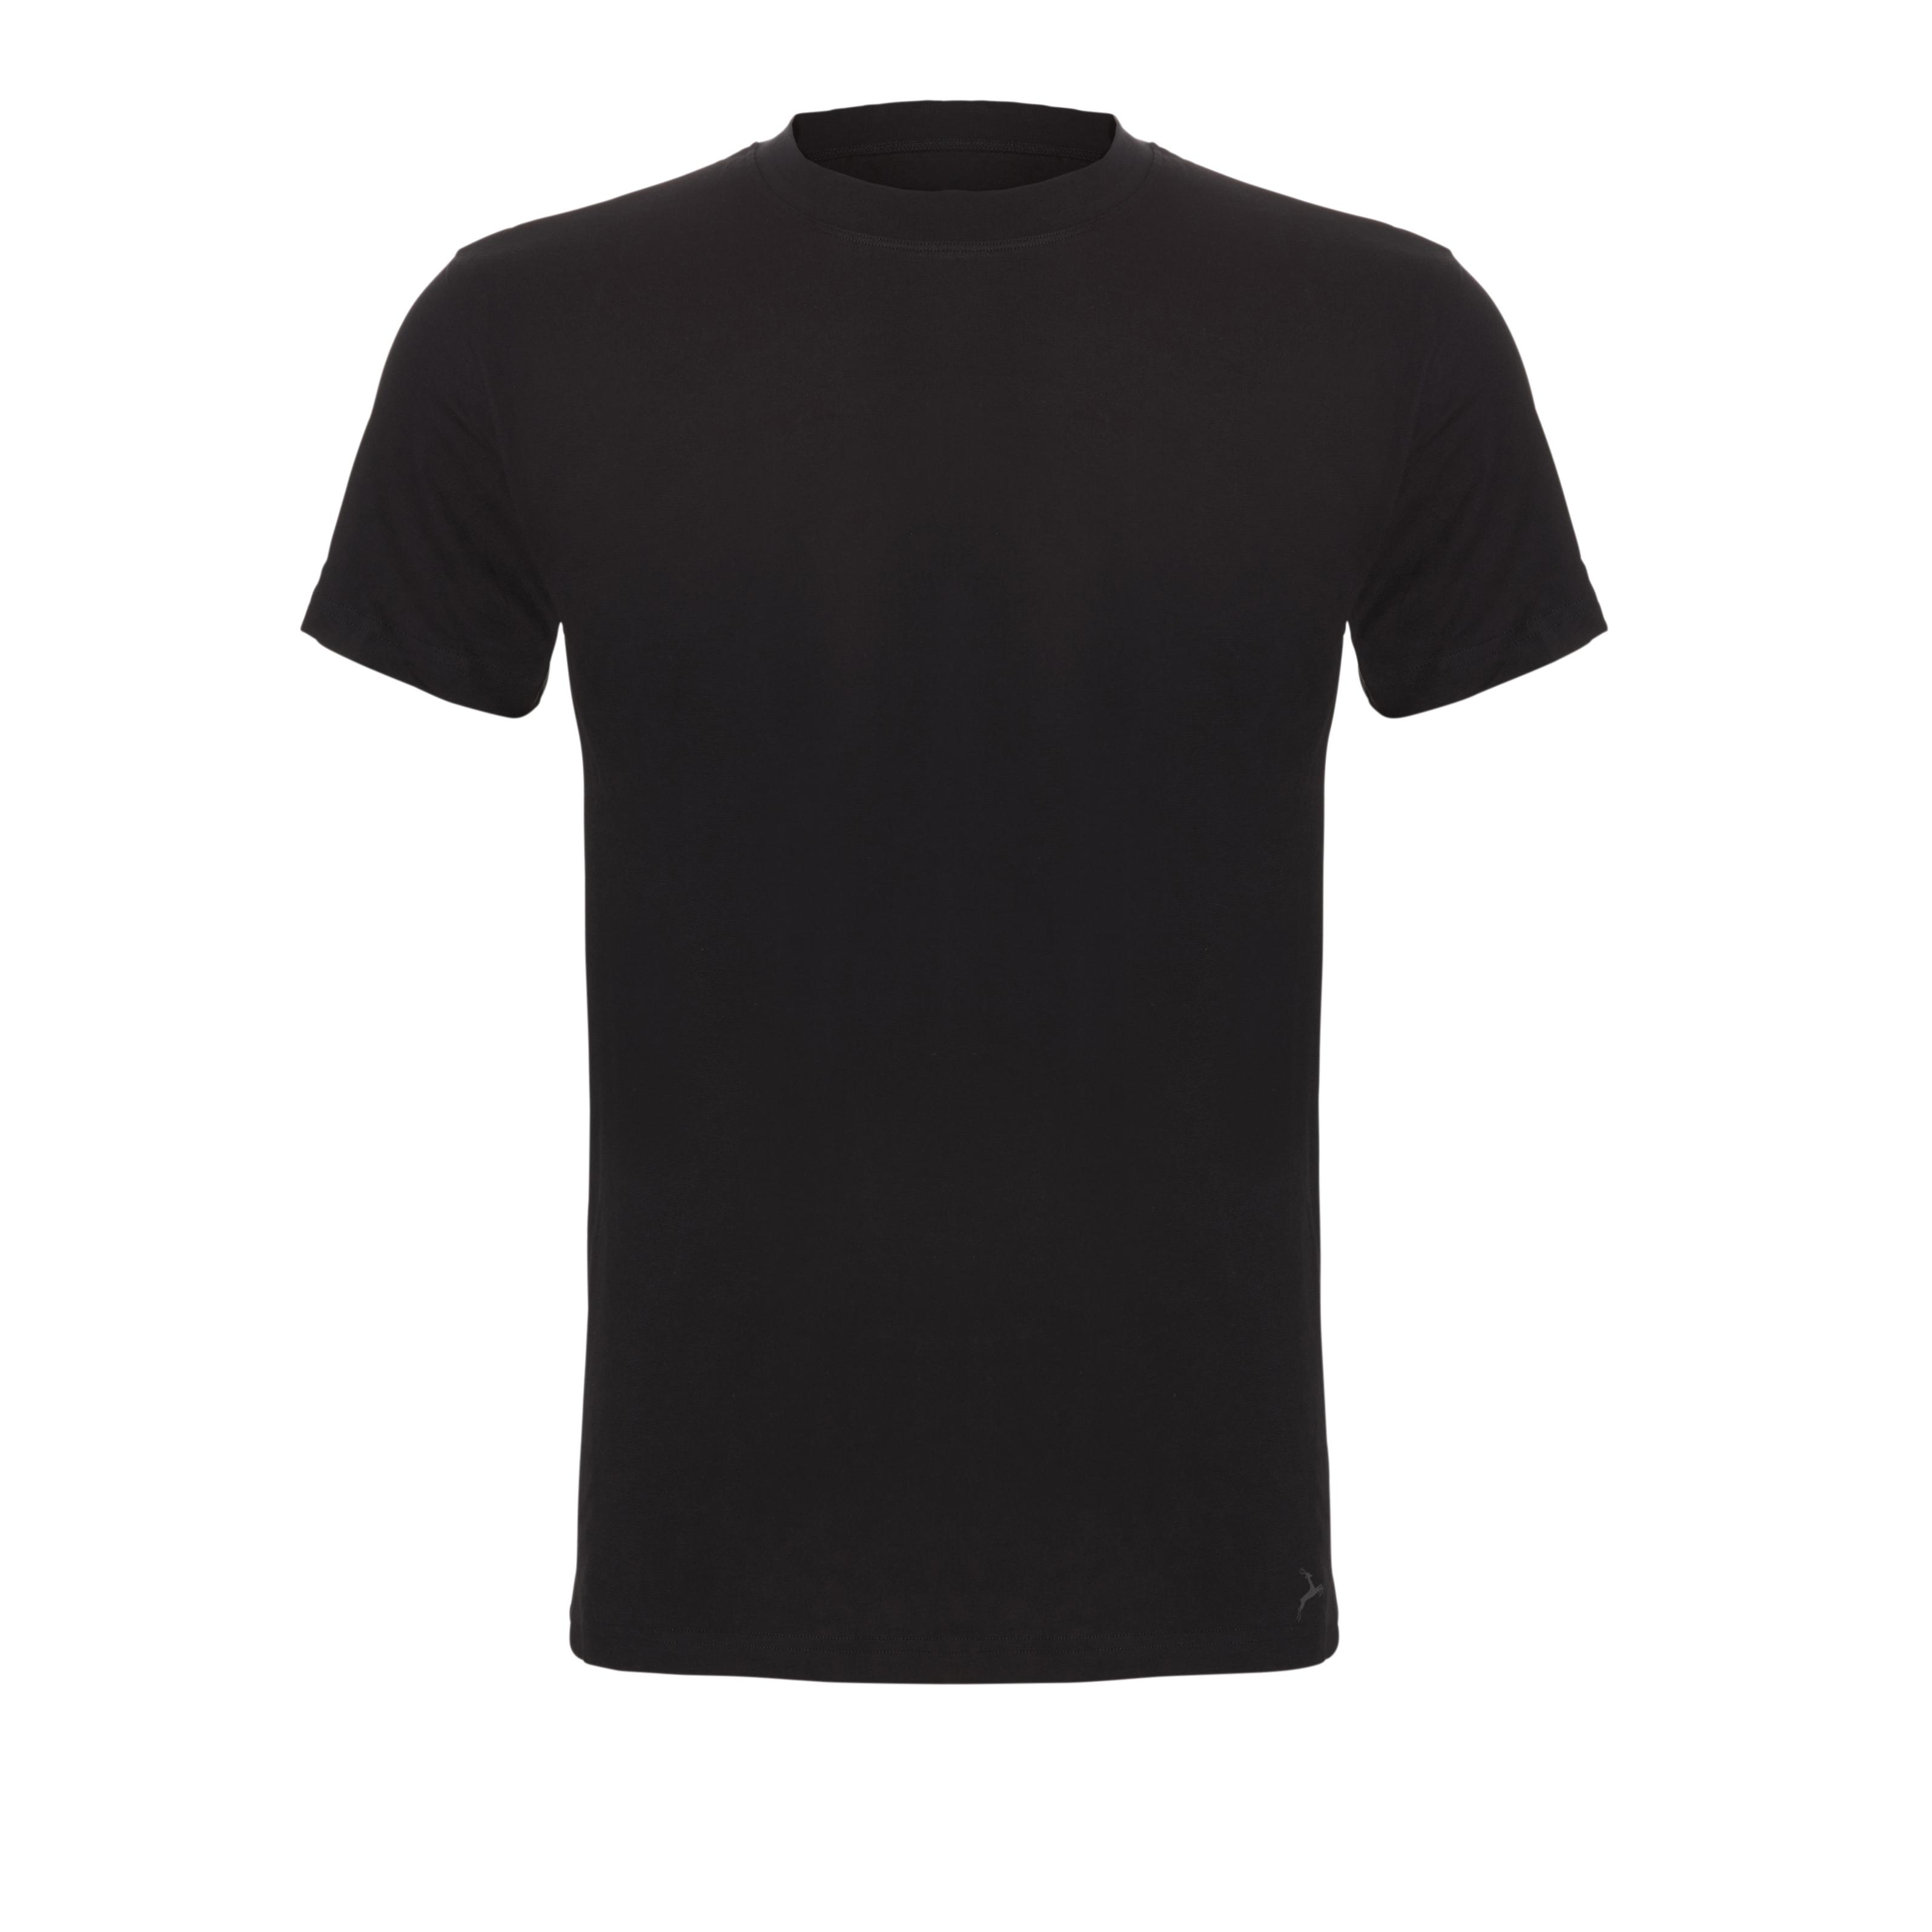 Ten Cate Men Basic t-shirt Bamboo Black